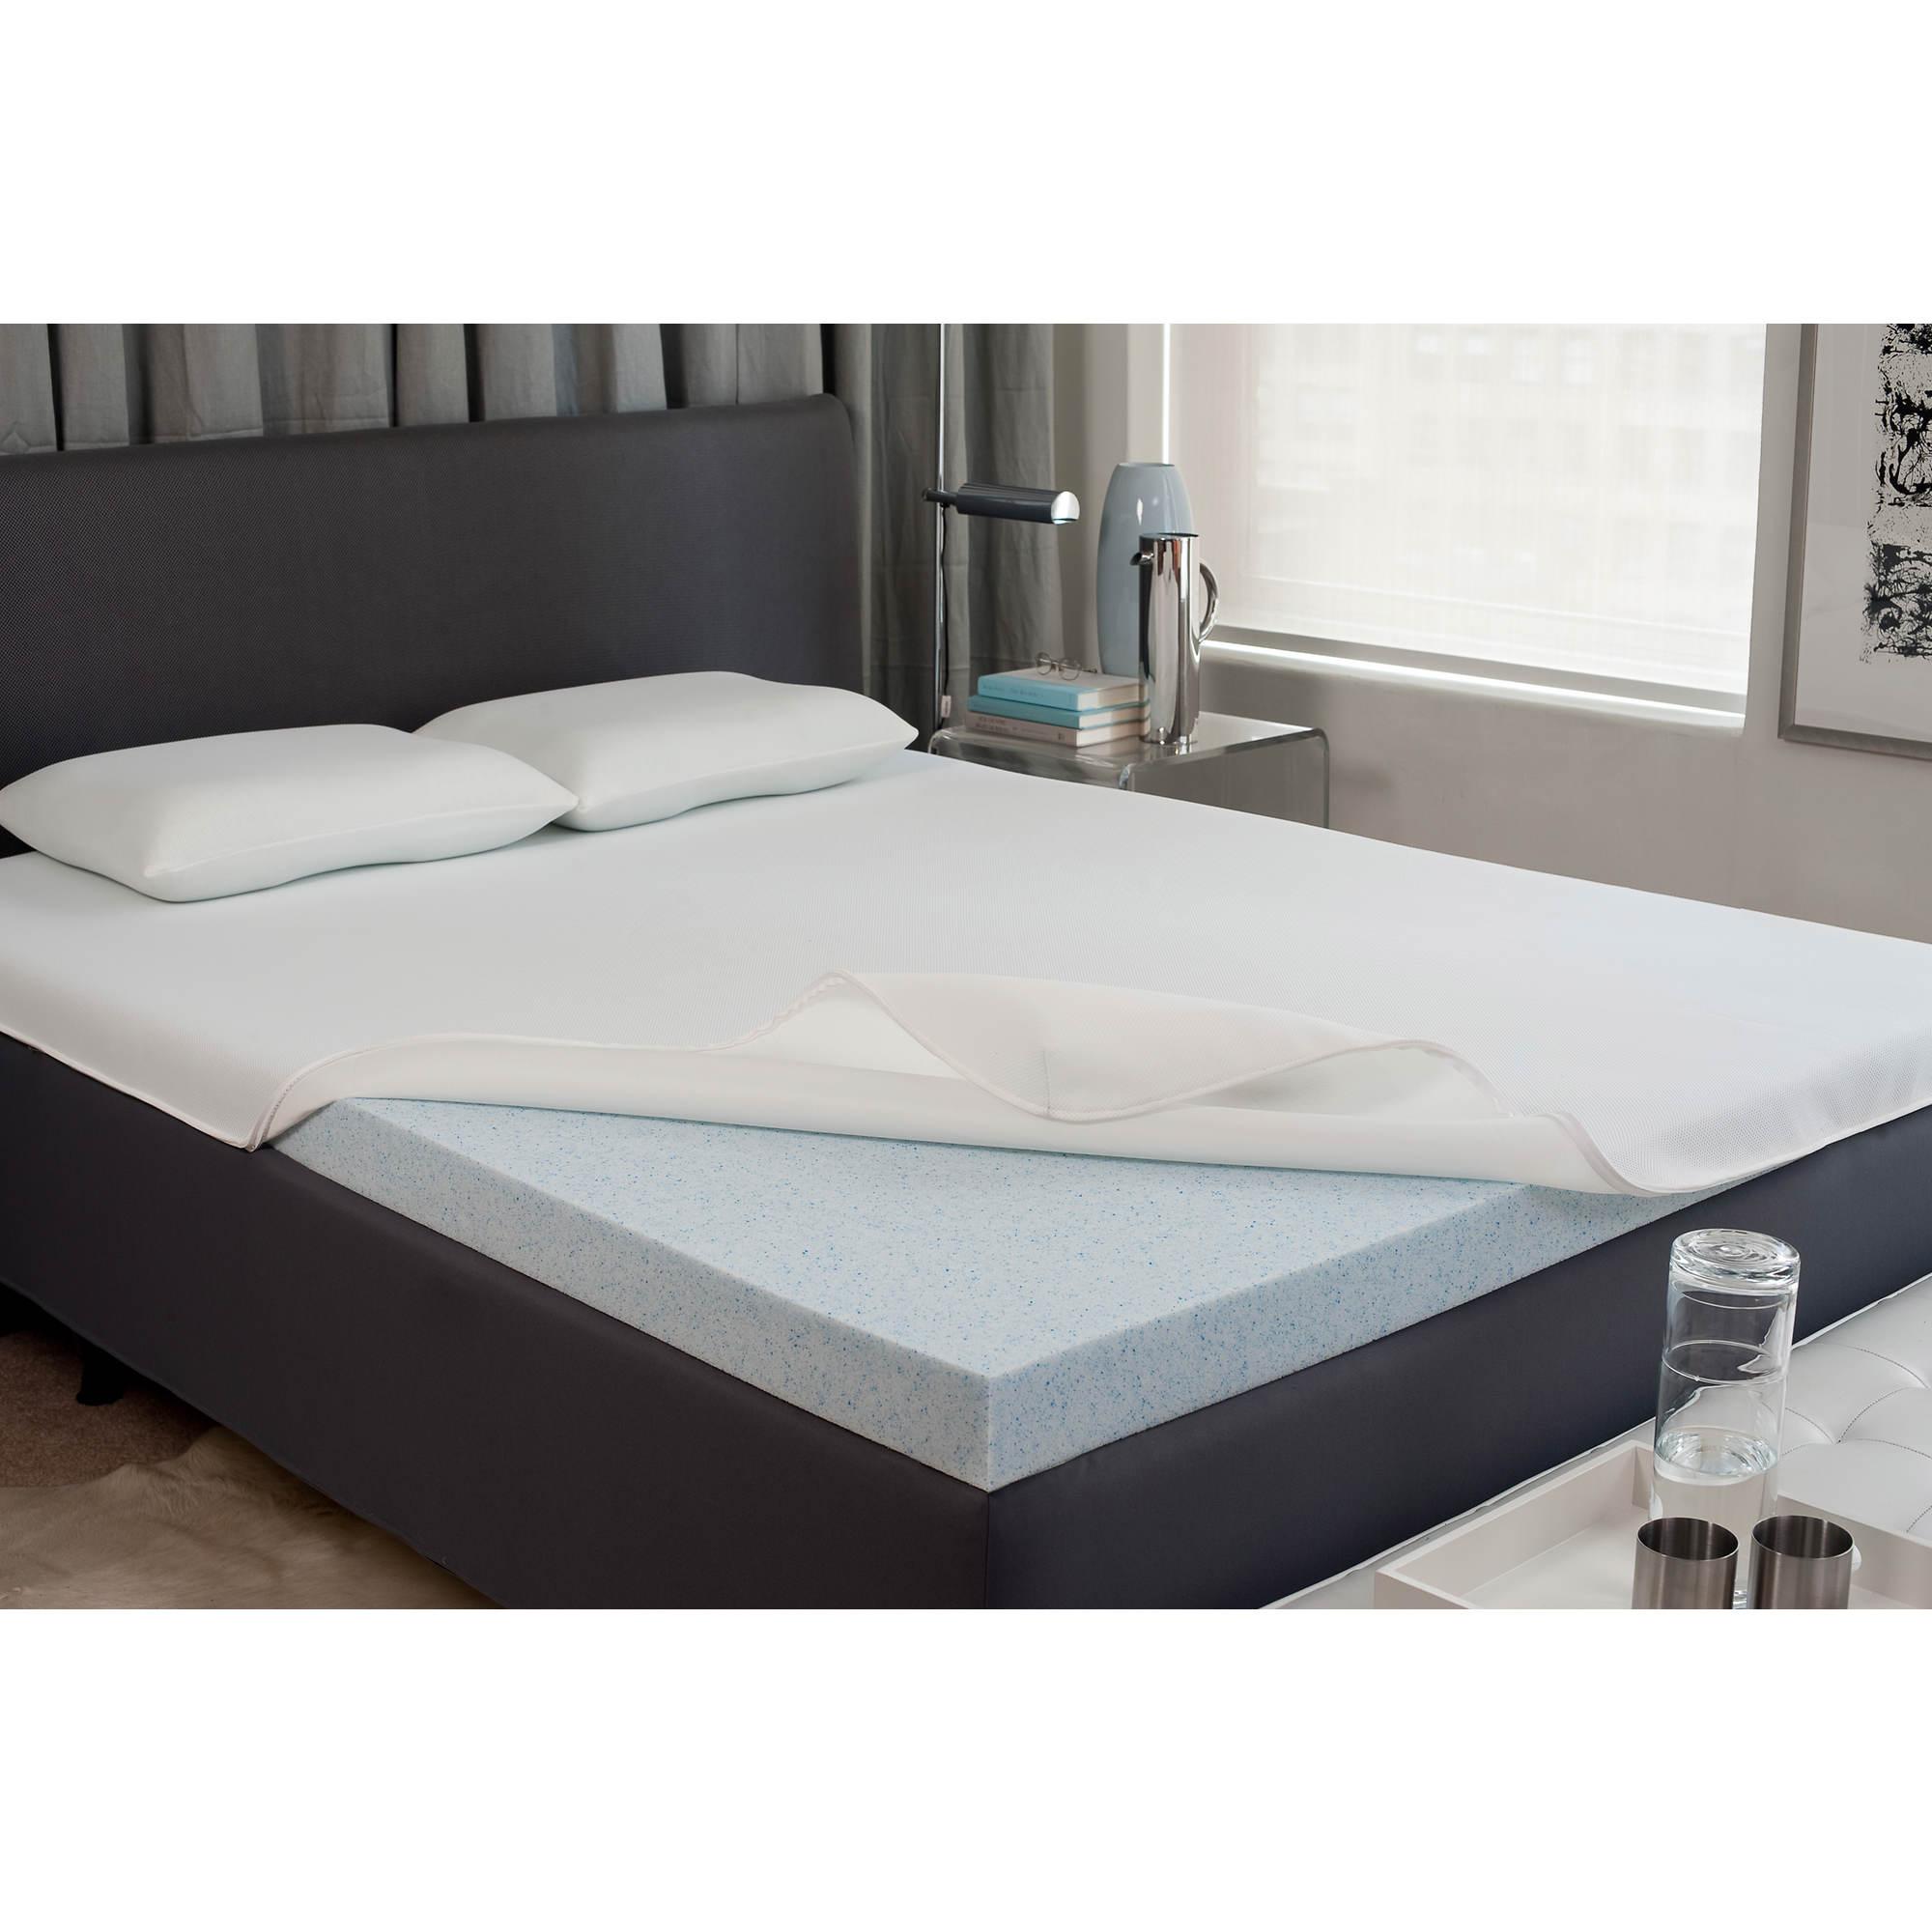 gel memory foam mattress 2 1 2 topper twin bjs wholesale club. Black Bedroom Furniture Sets. Home Design Ideas